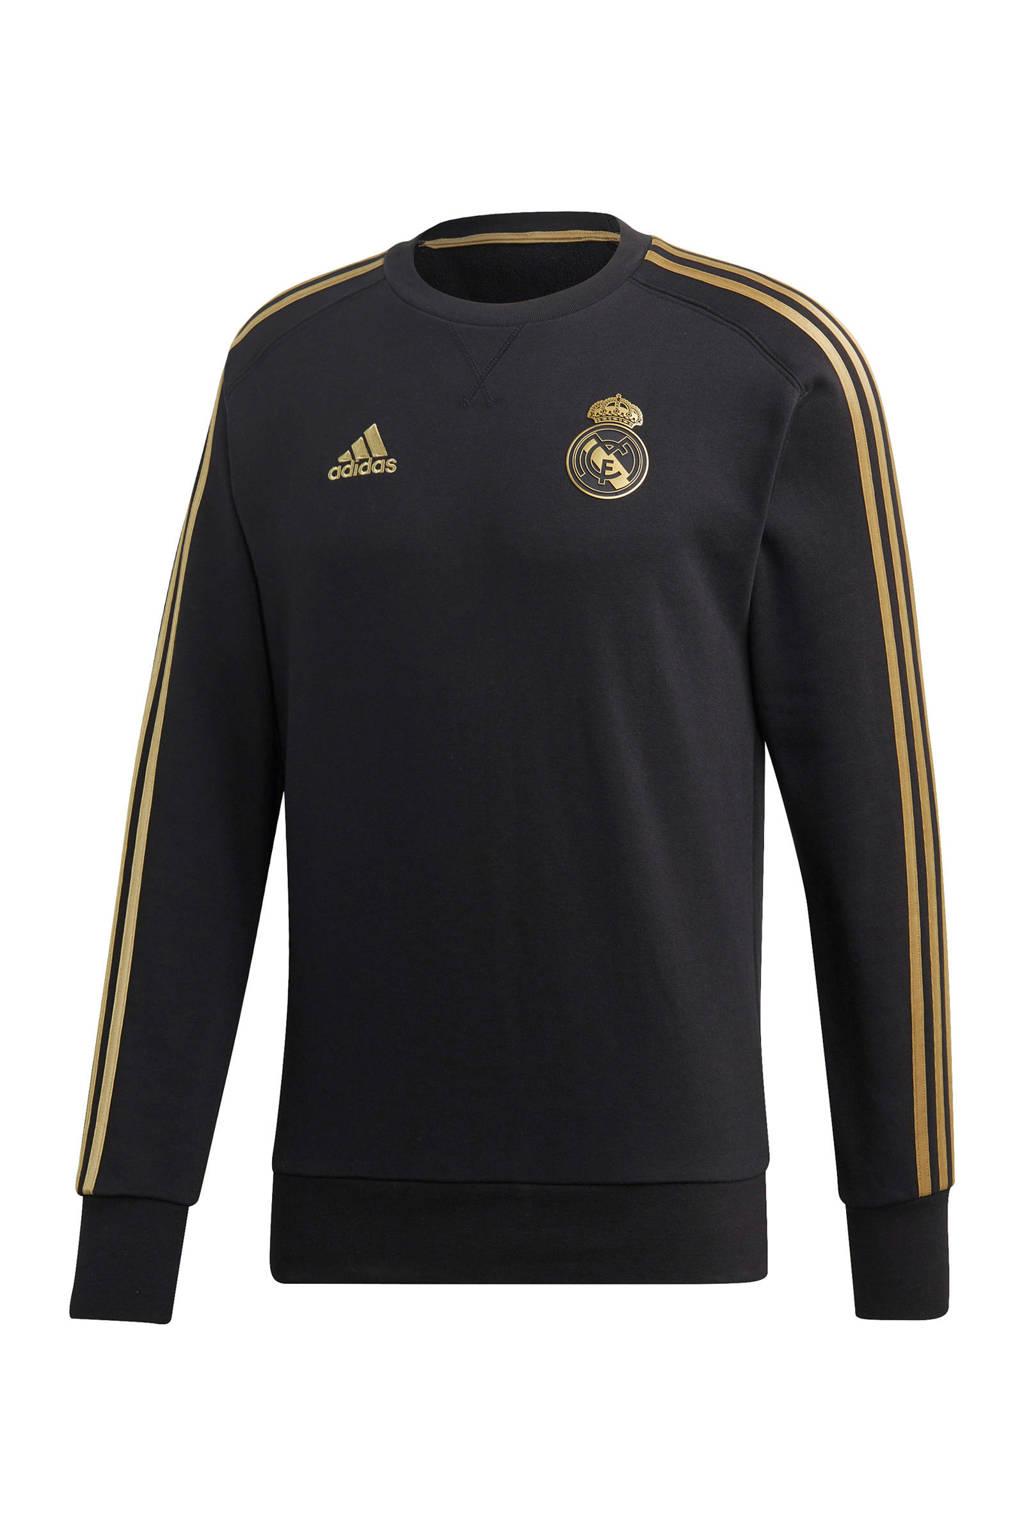 adidas Senior Real Madrid voetbalsweater, Zwart/goud